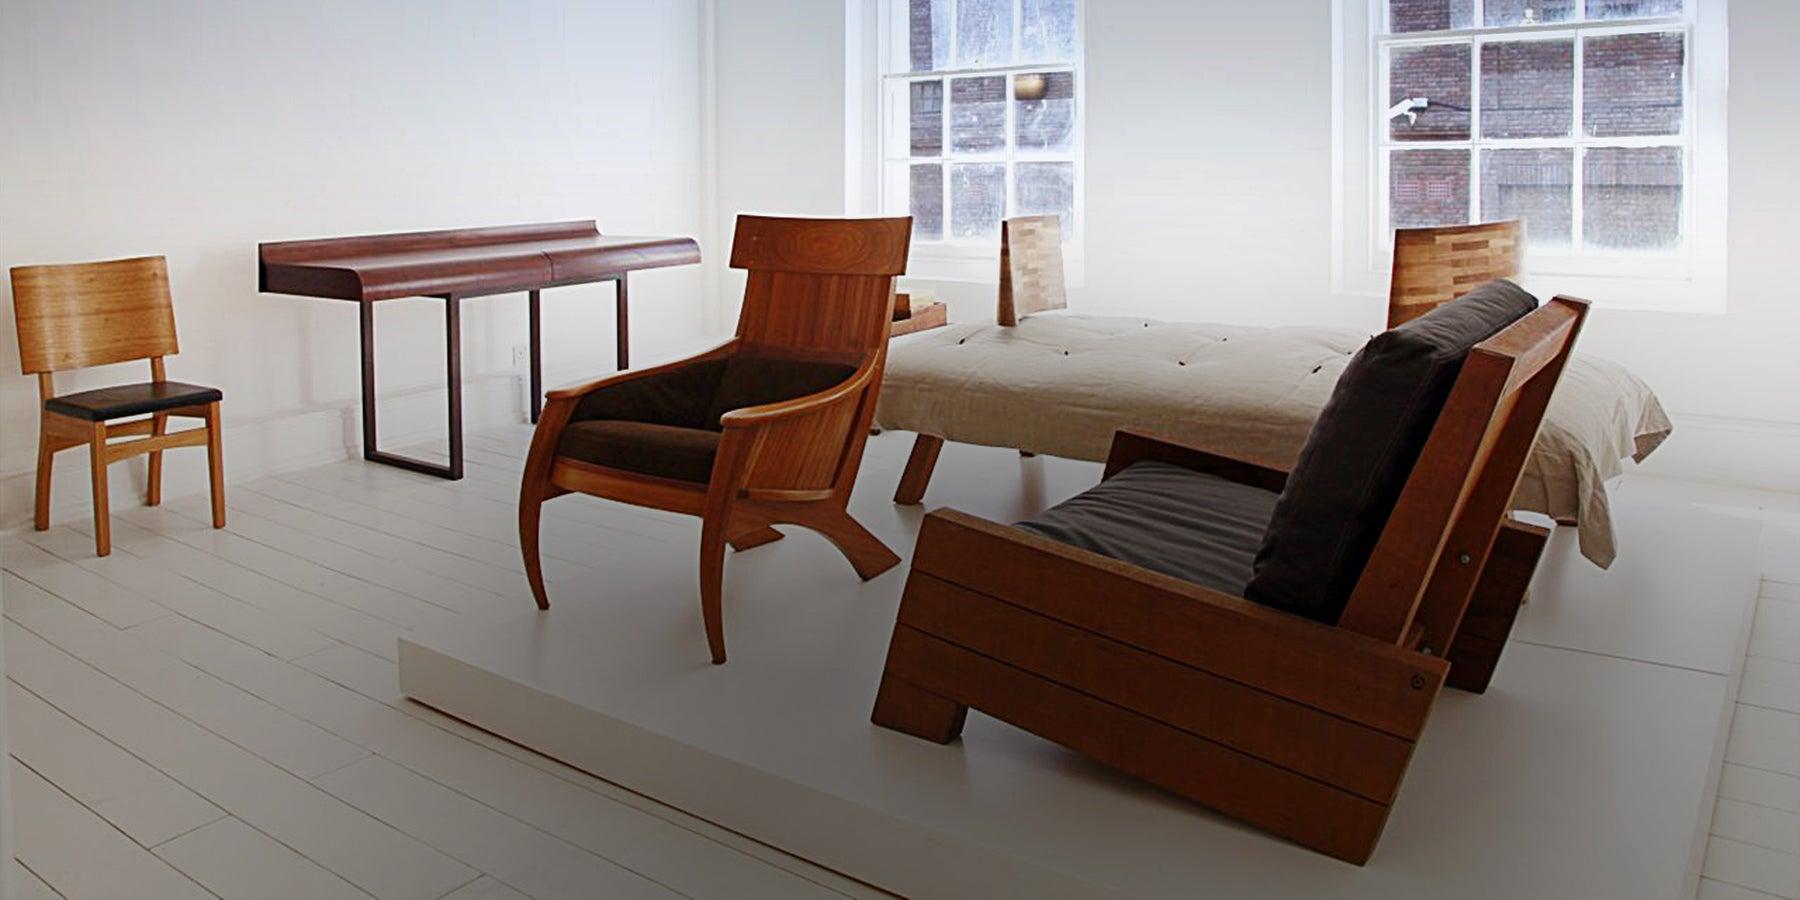 Modern brazilian furniture comes to london